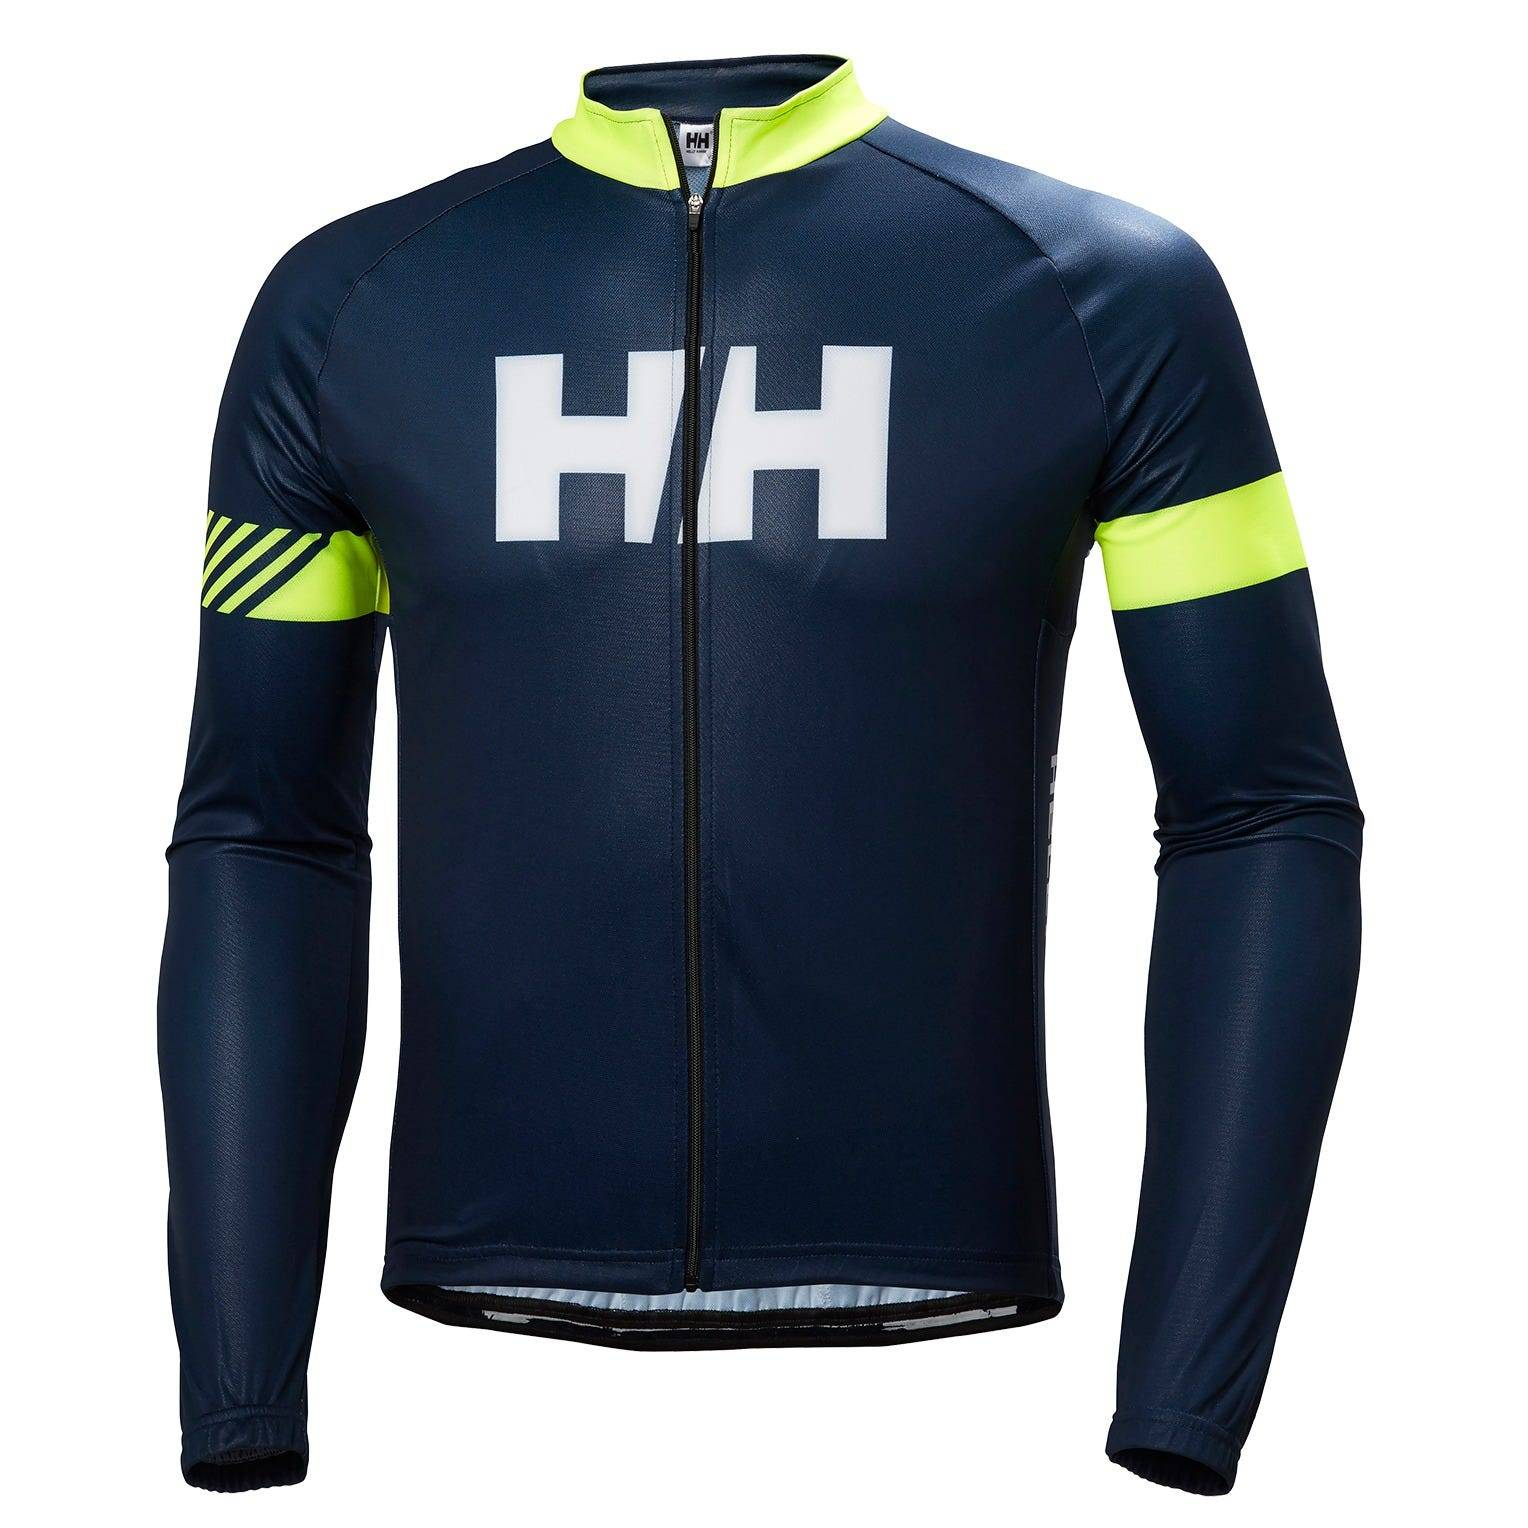 Helly Hansen Bike Windprotection Jacket Mens